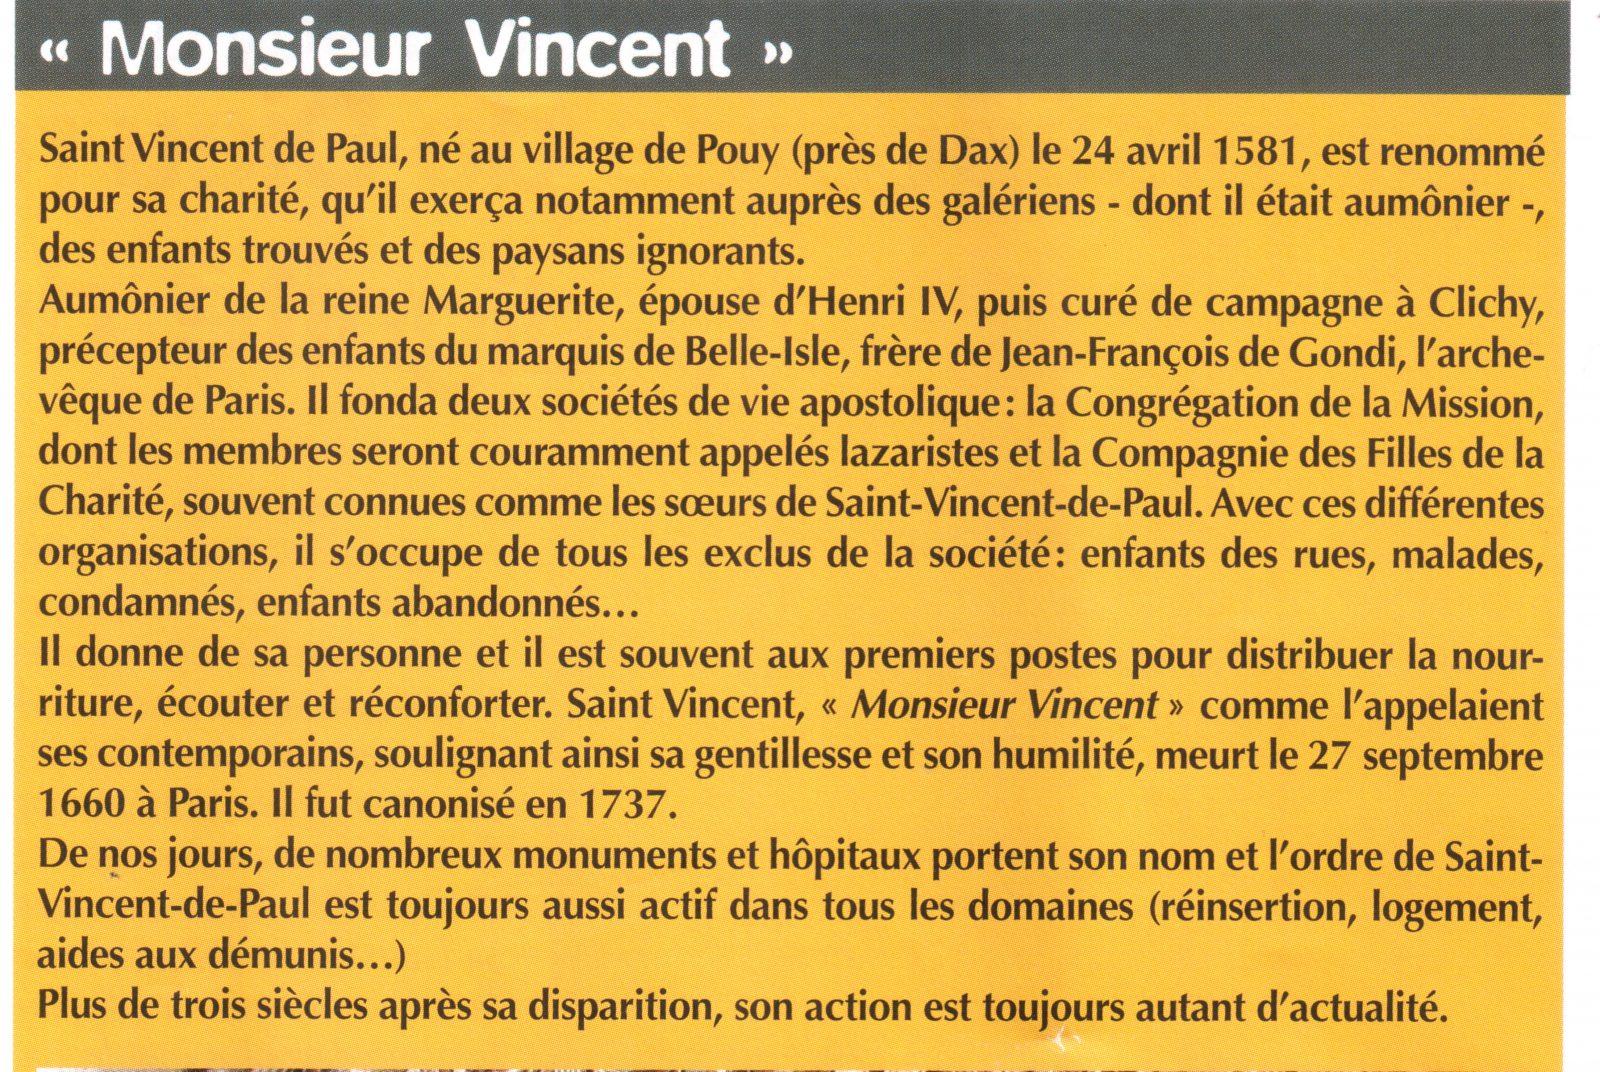 Mr Vincent